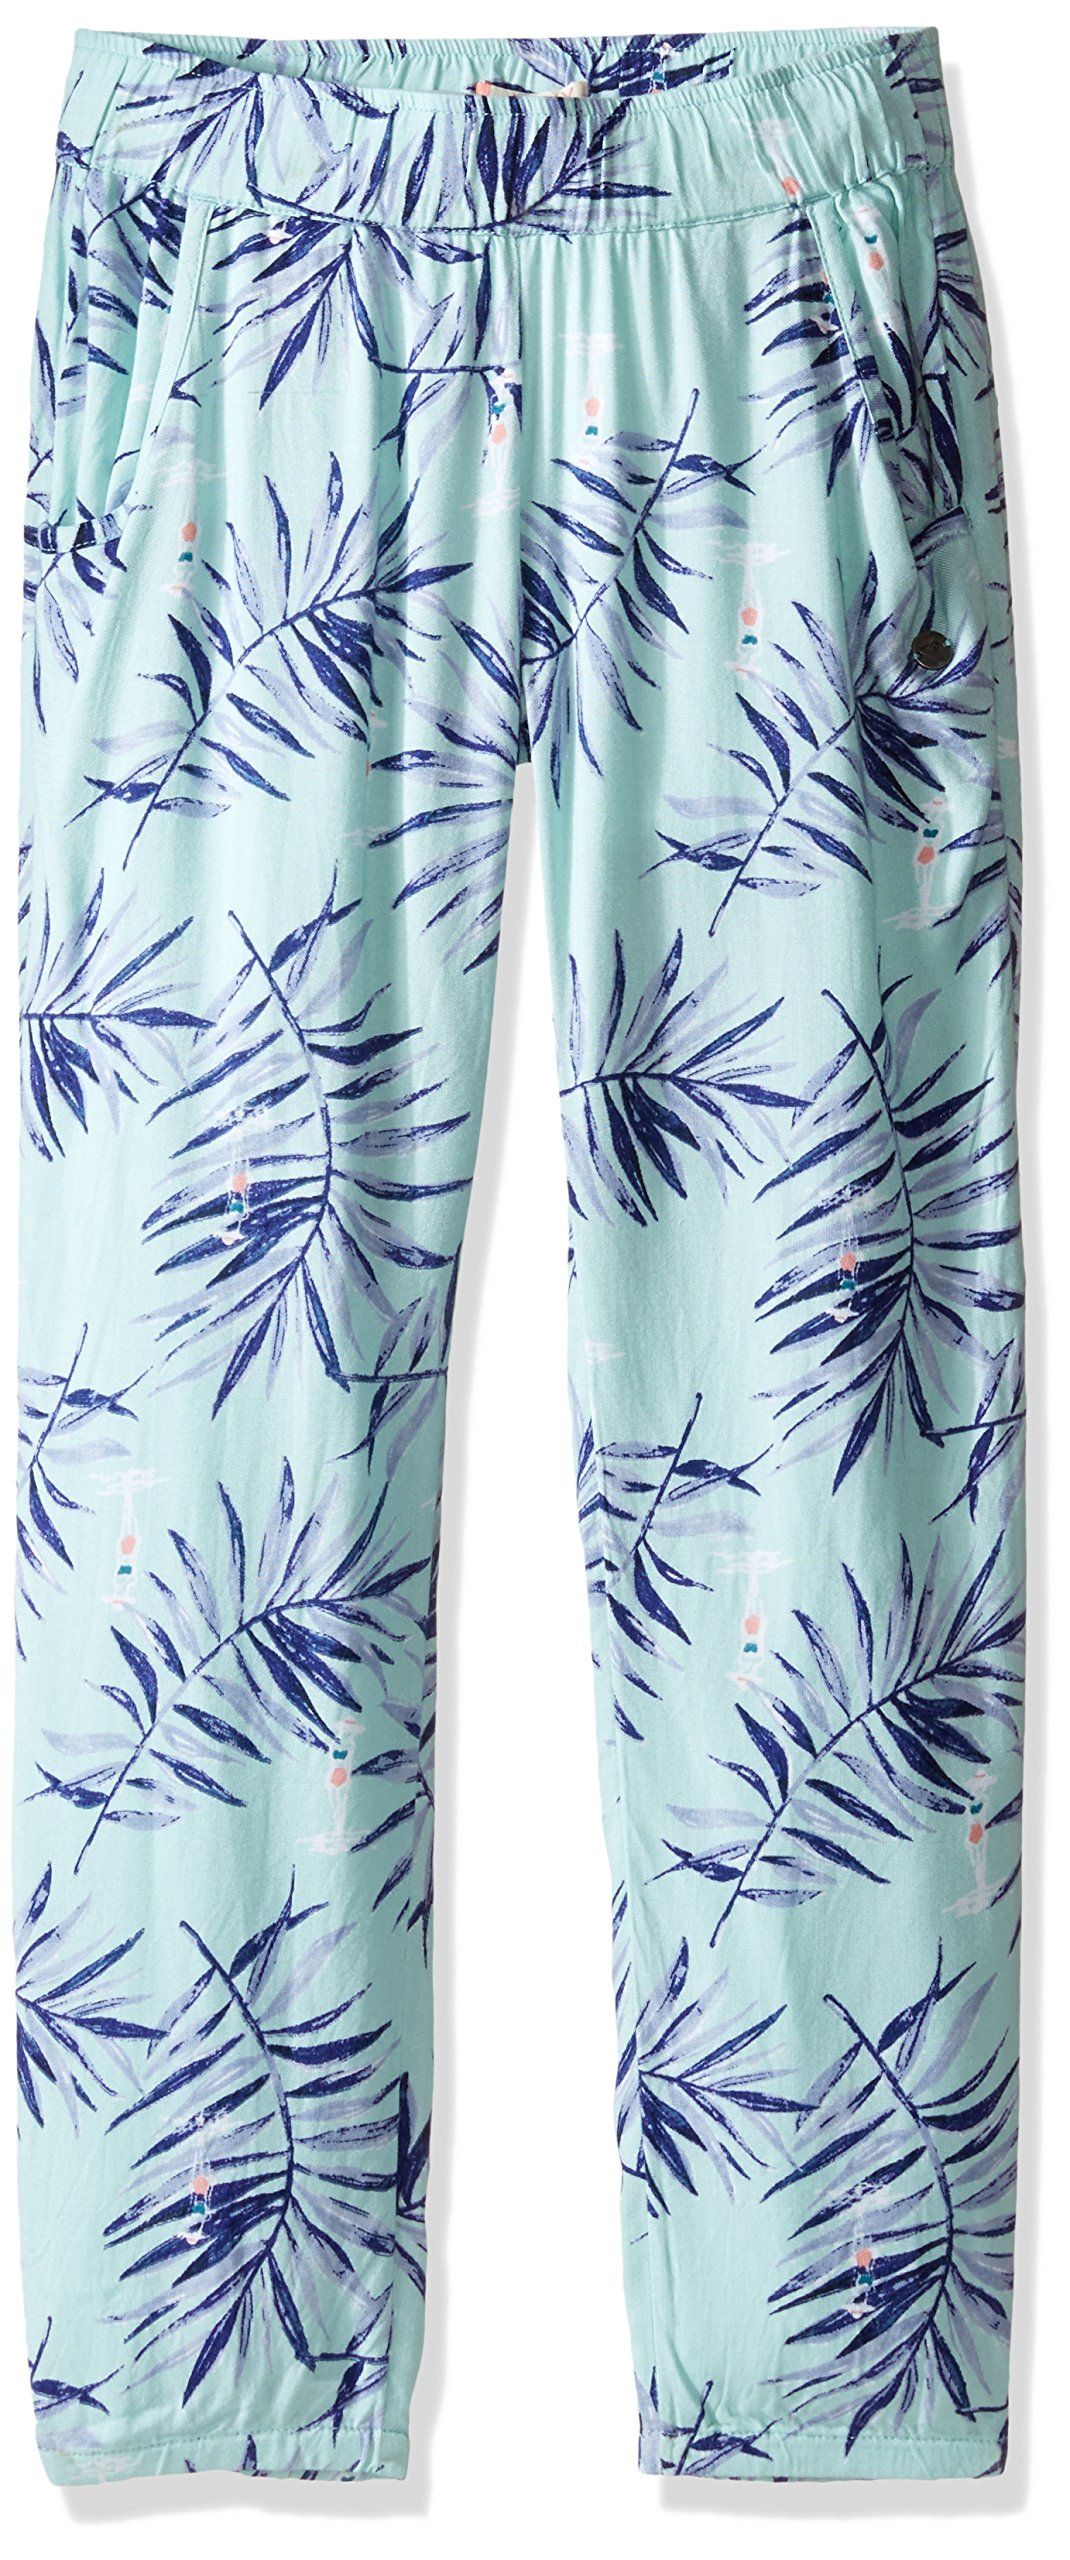 Roxy Big Girls' Wanna Go Holiday Pant, Beach Glass La Croisette, 8